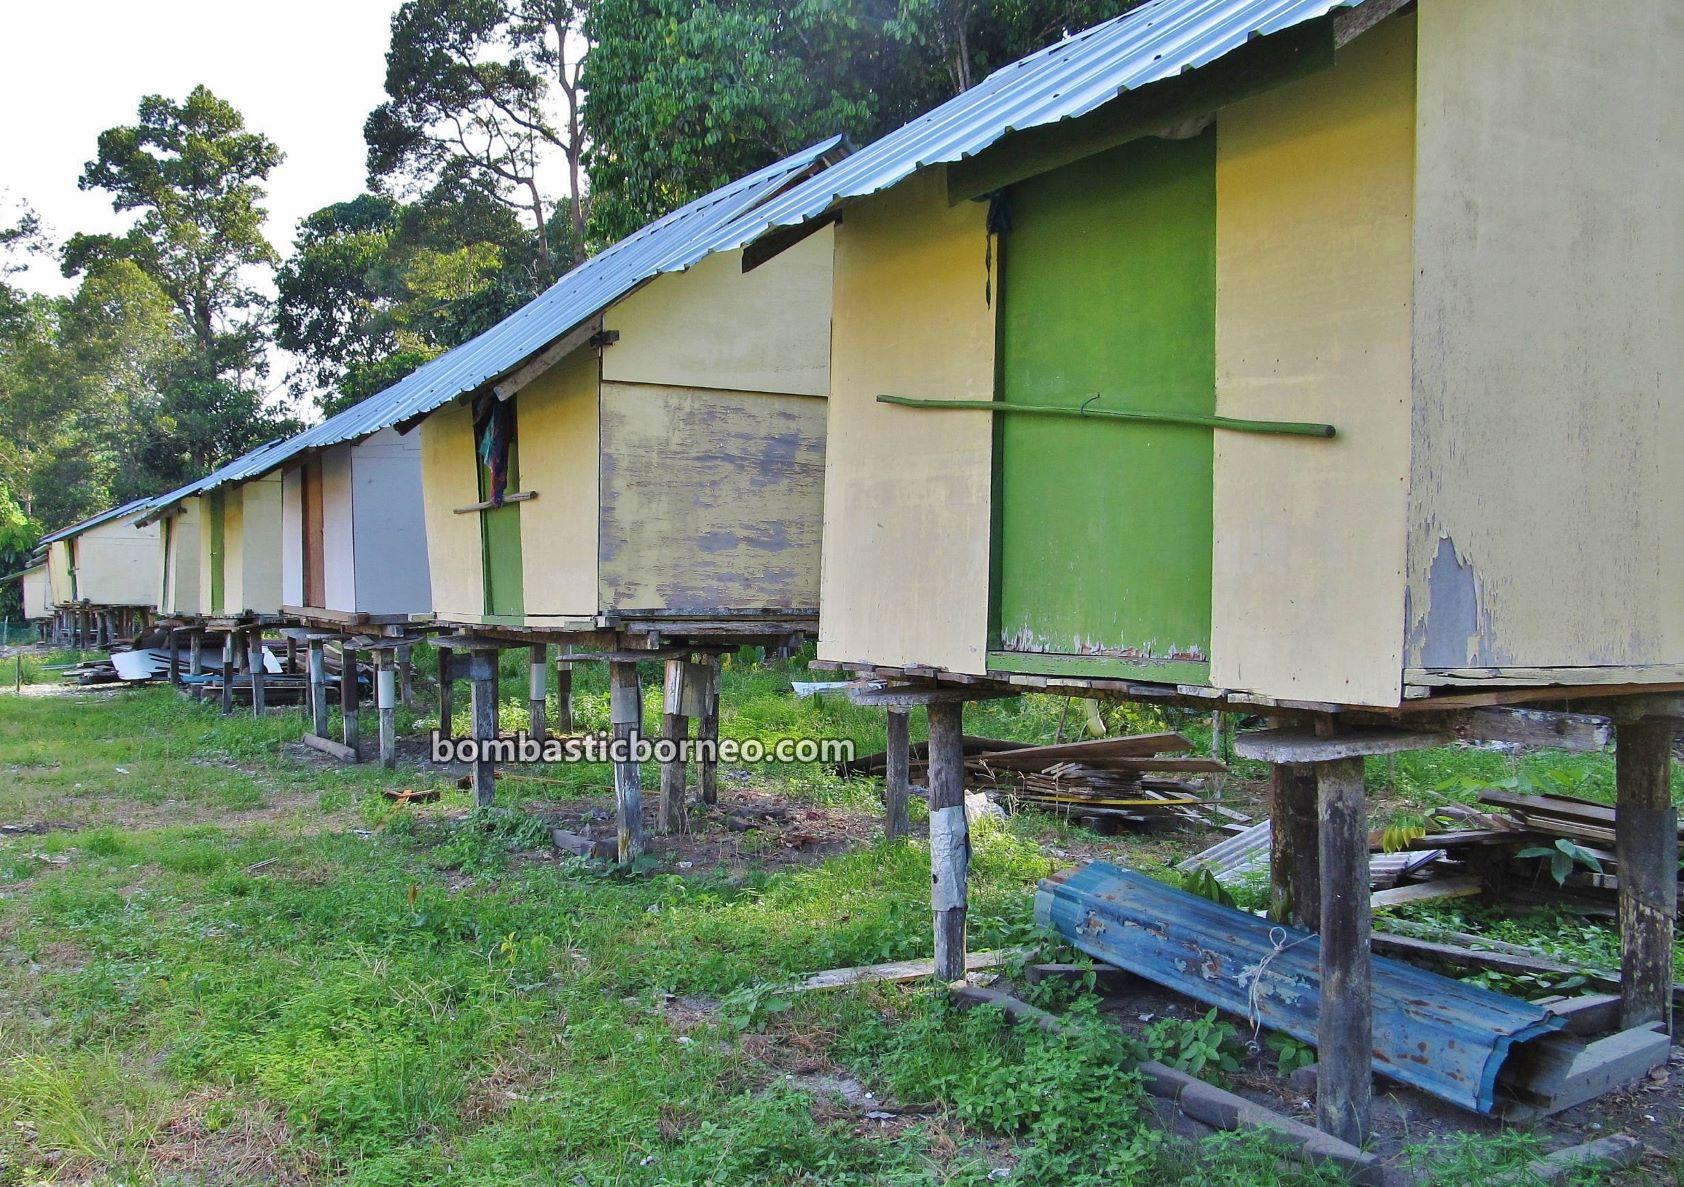 Village, paddy silo, Traditional, Dayak Selako, native, culture, Malaysia, Tourism, tourist attraction, exploration, travel guide, travel locally, Borneo, 探索婆罗洲游踪, 马来西亚砂拉越